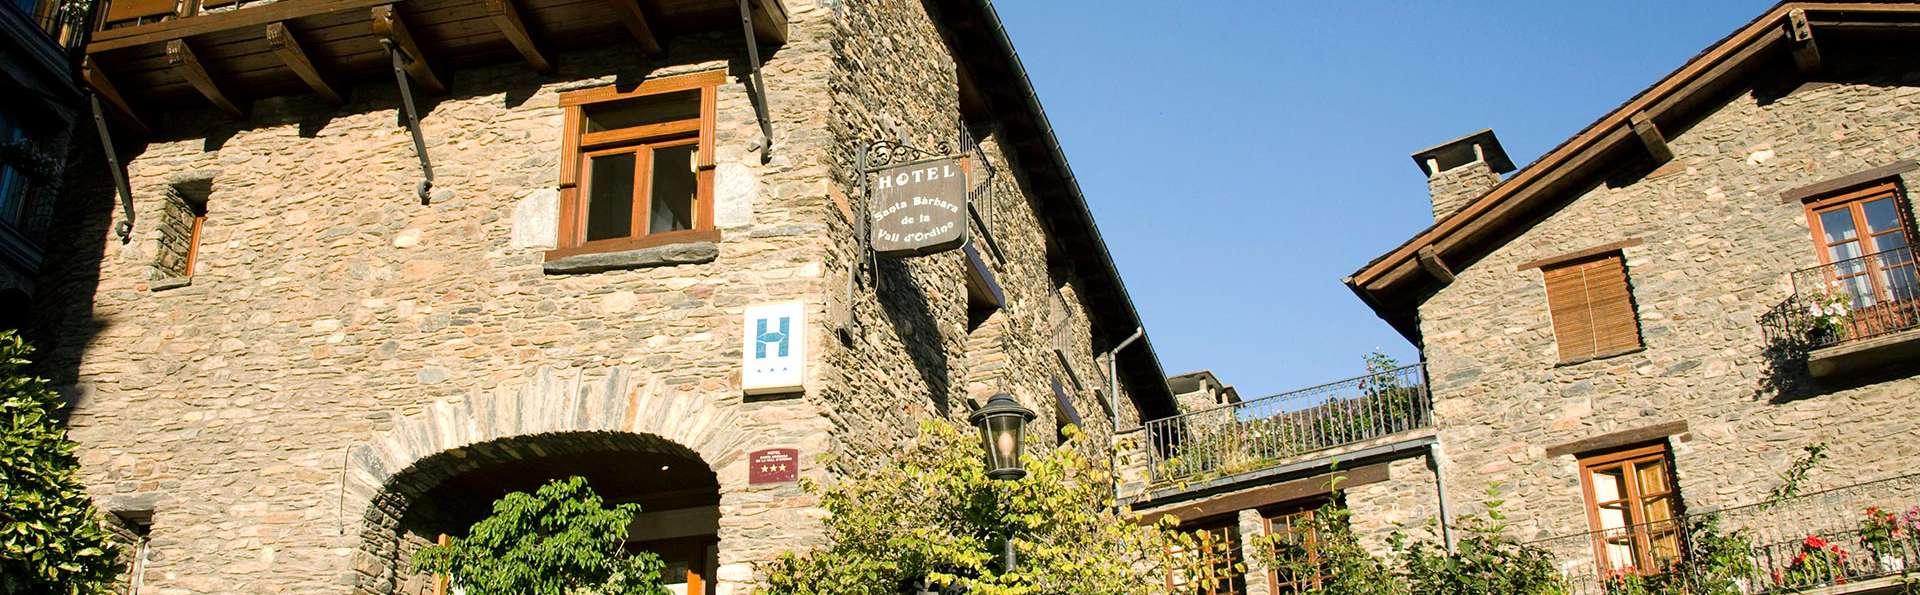 Hotel Santa Bàrbara de la Vall d'Ordino - edit_front.jpg